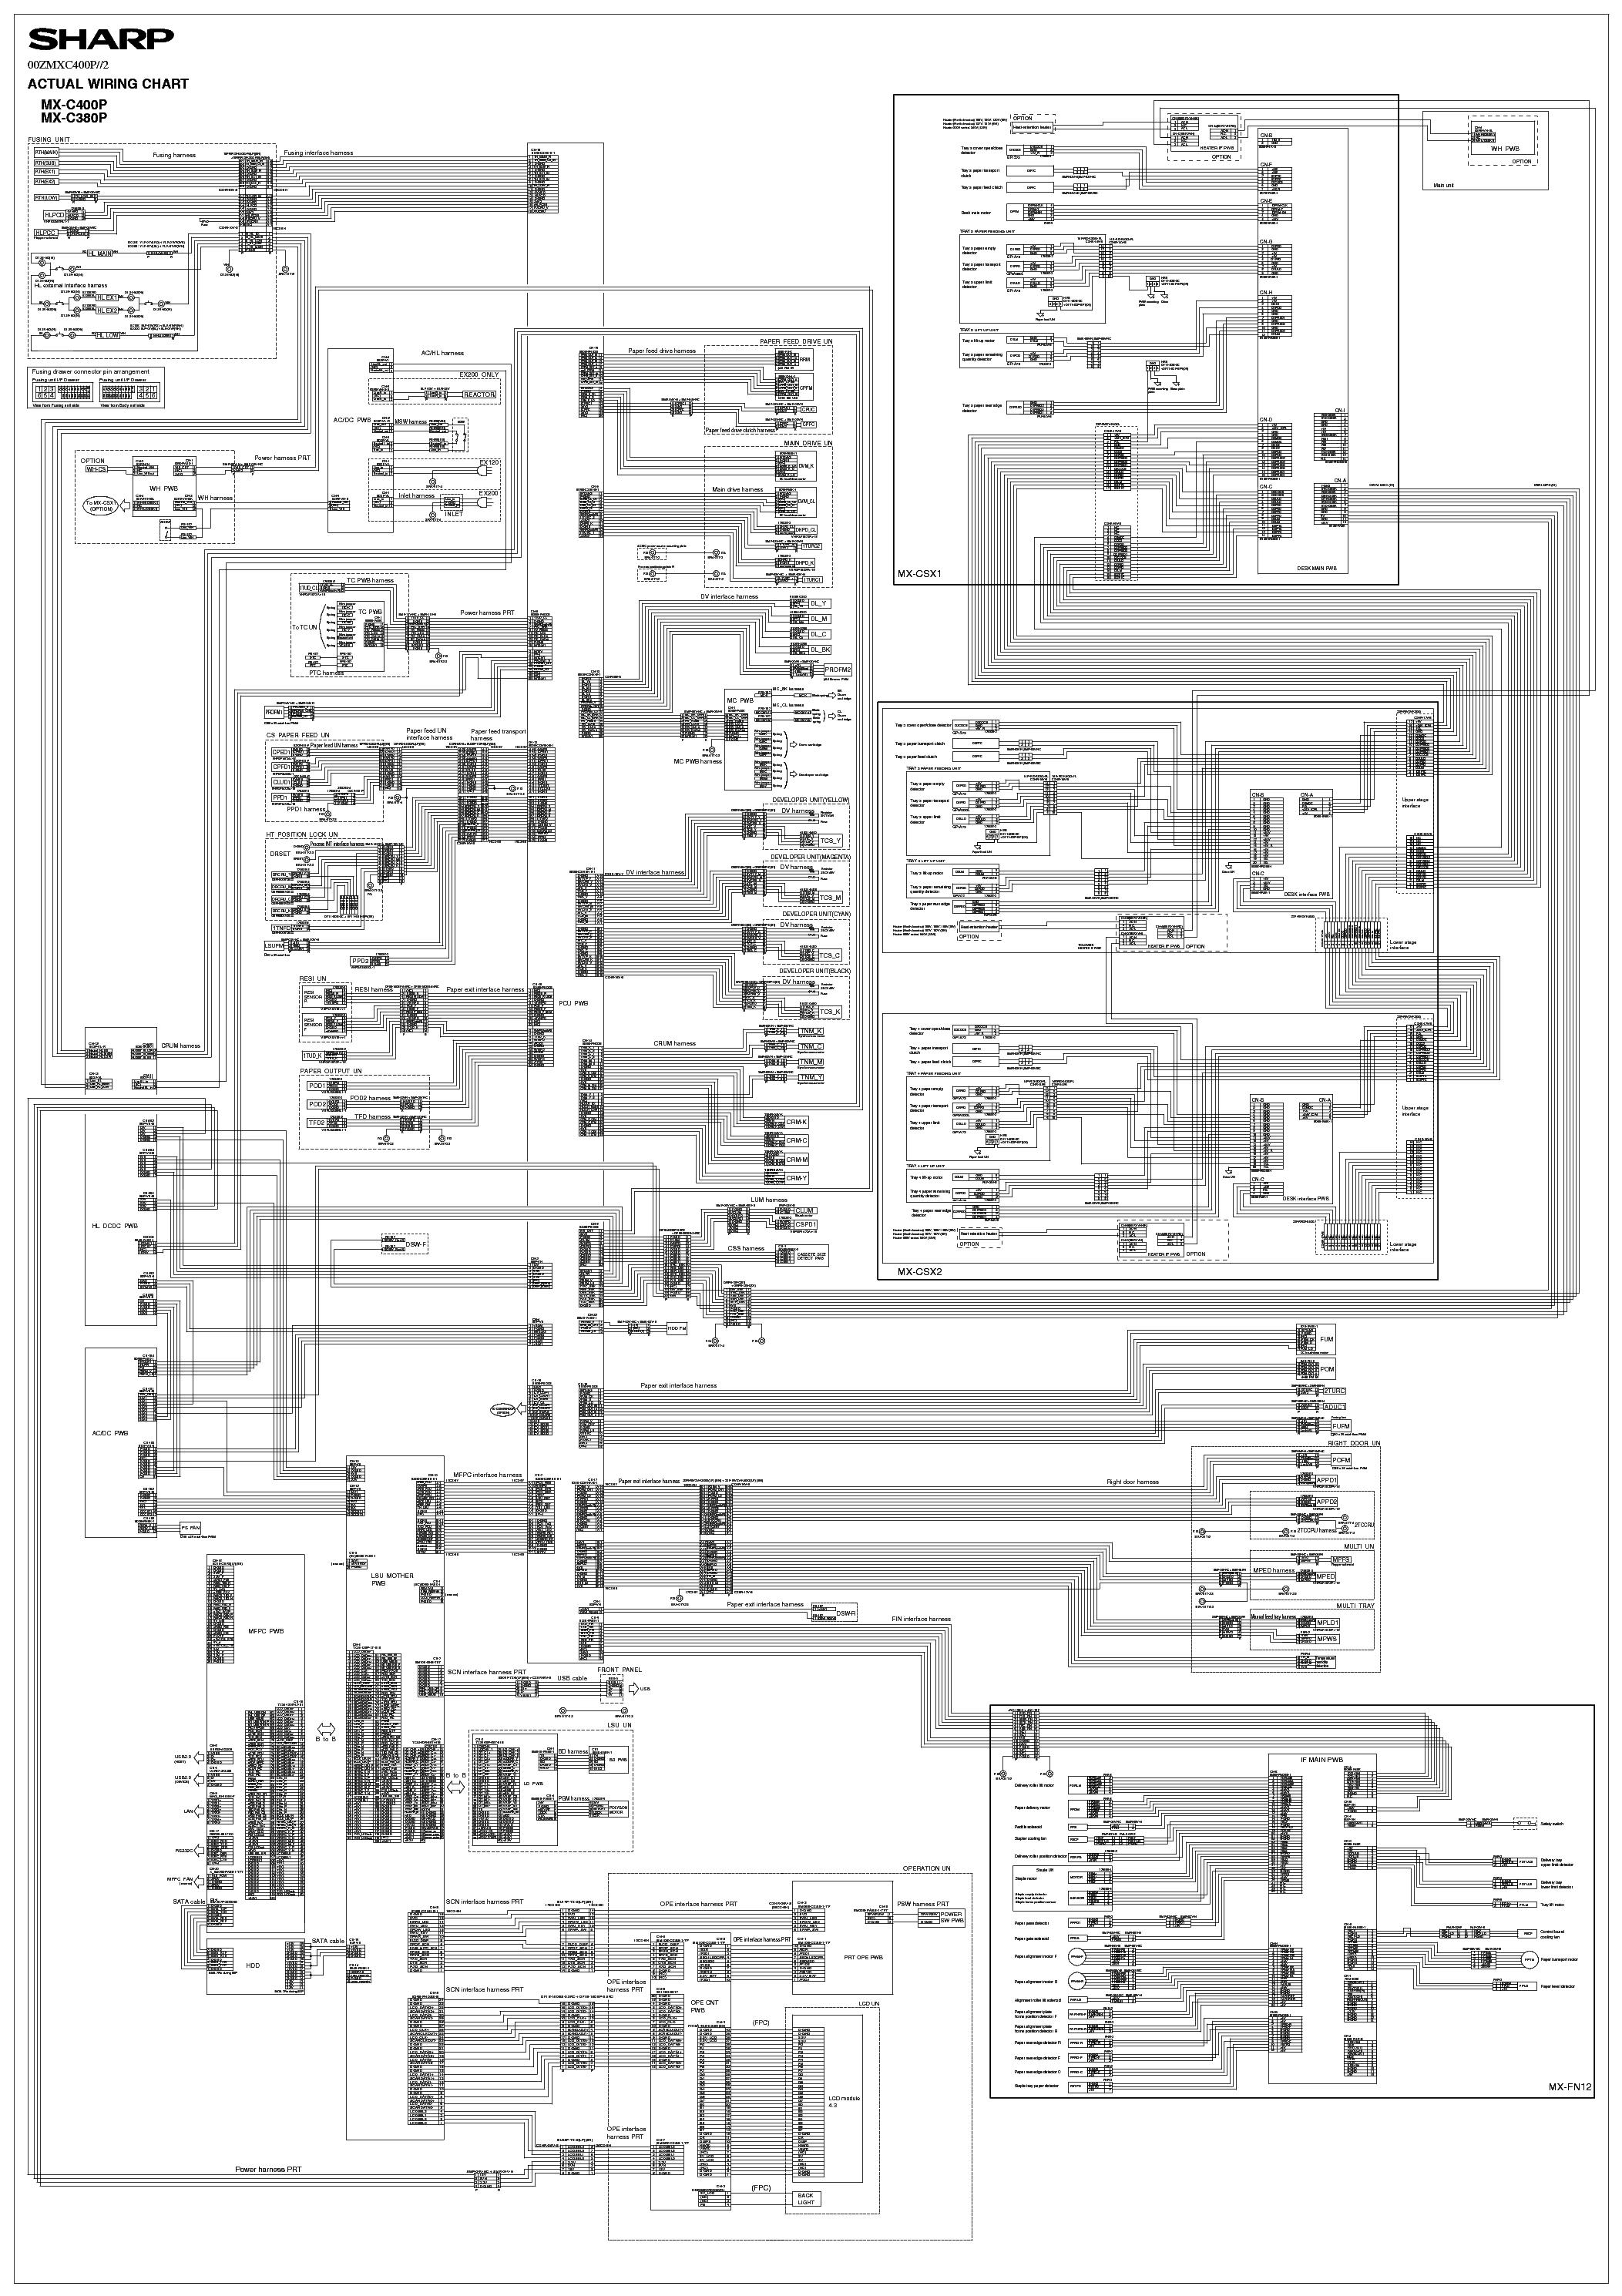 SHARP MX-C380P MX-C400P WIRING DIAGRAM Service Manual